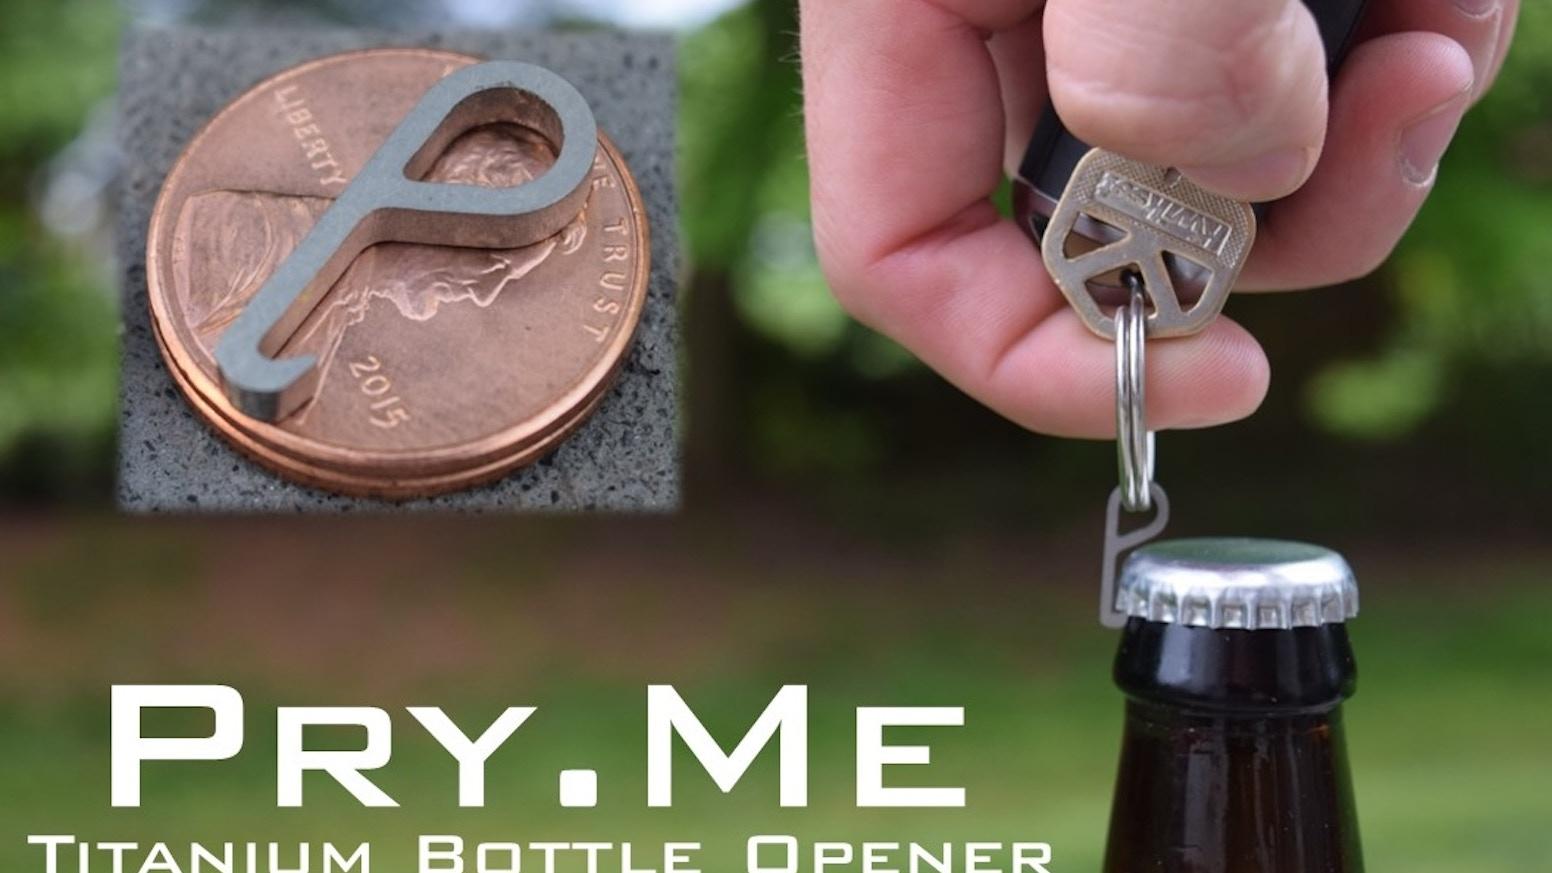 pry me grade 5 titanium micro bottle opener by brian kickstarter. Black Bedroom Furniture Sets. Home Design Ideas